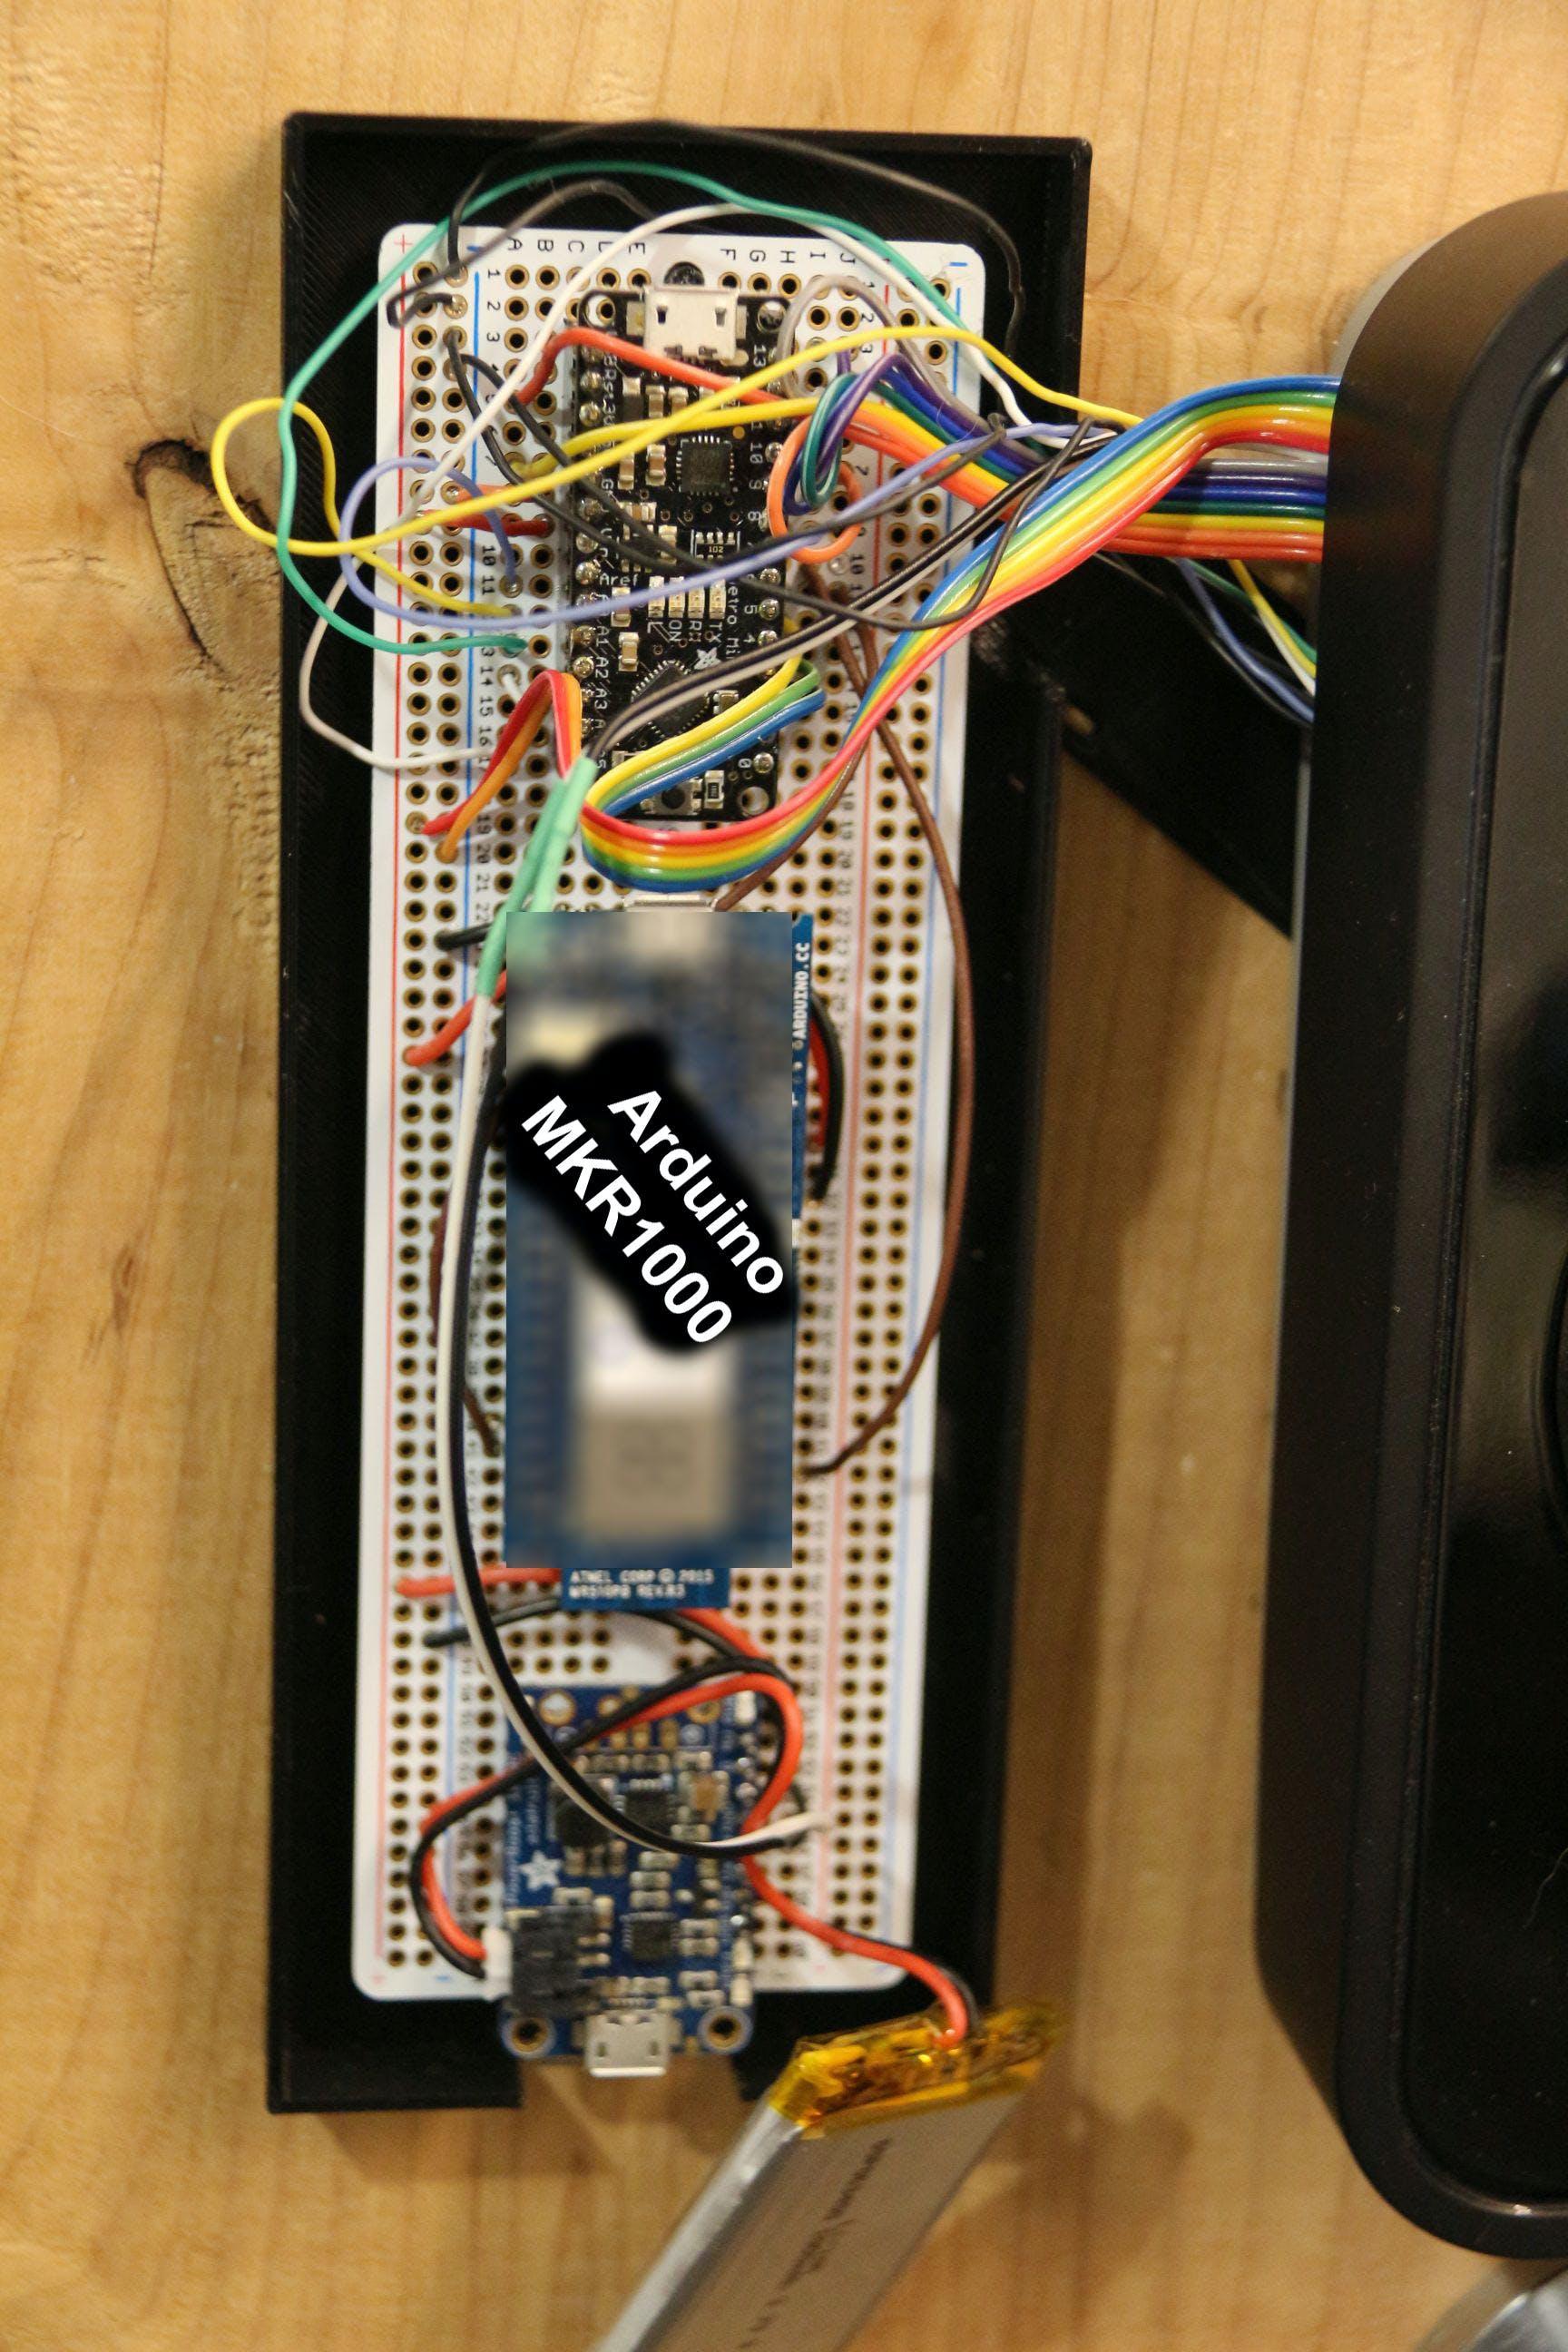 Circuit layout